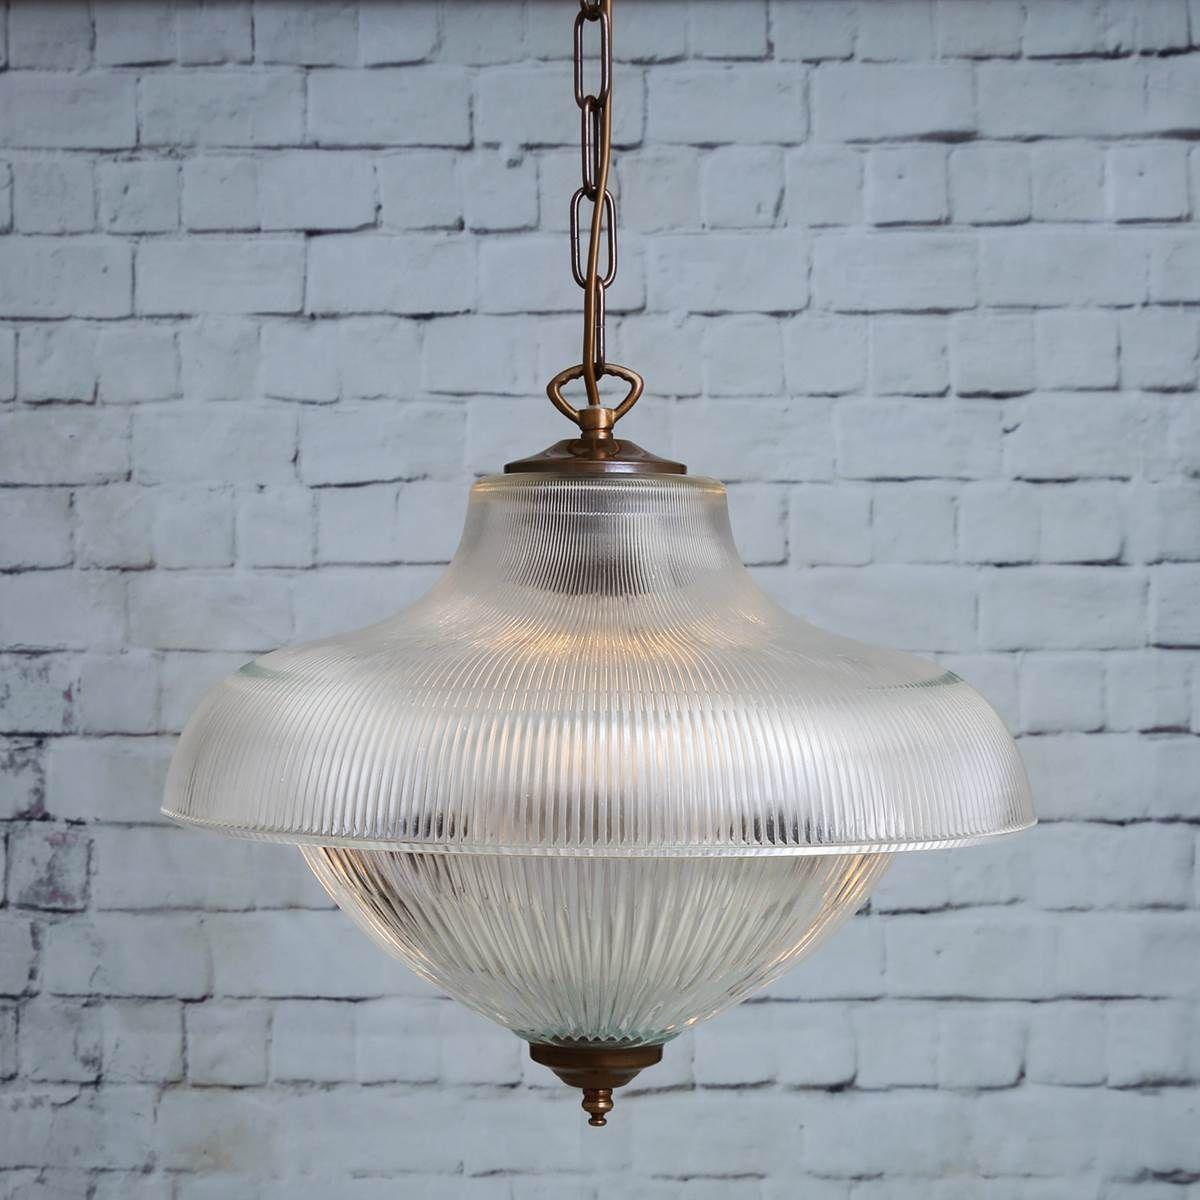 Essence double prismatic pendant light | Pendant lighting, Pendants ...